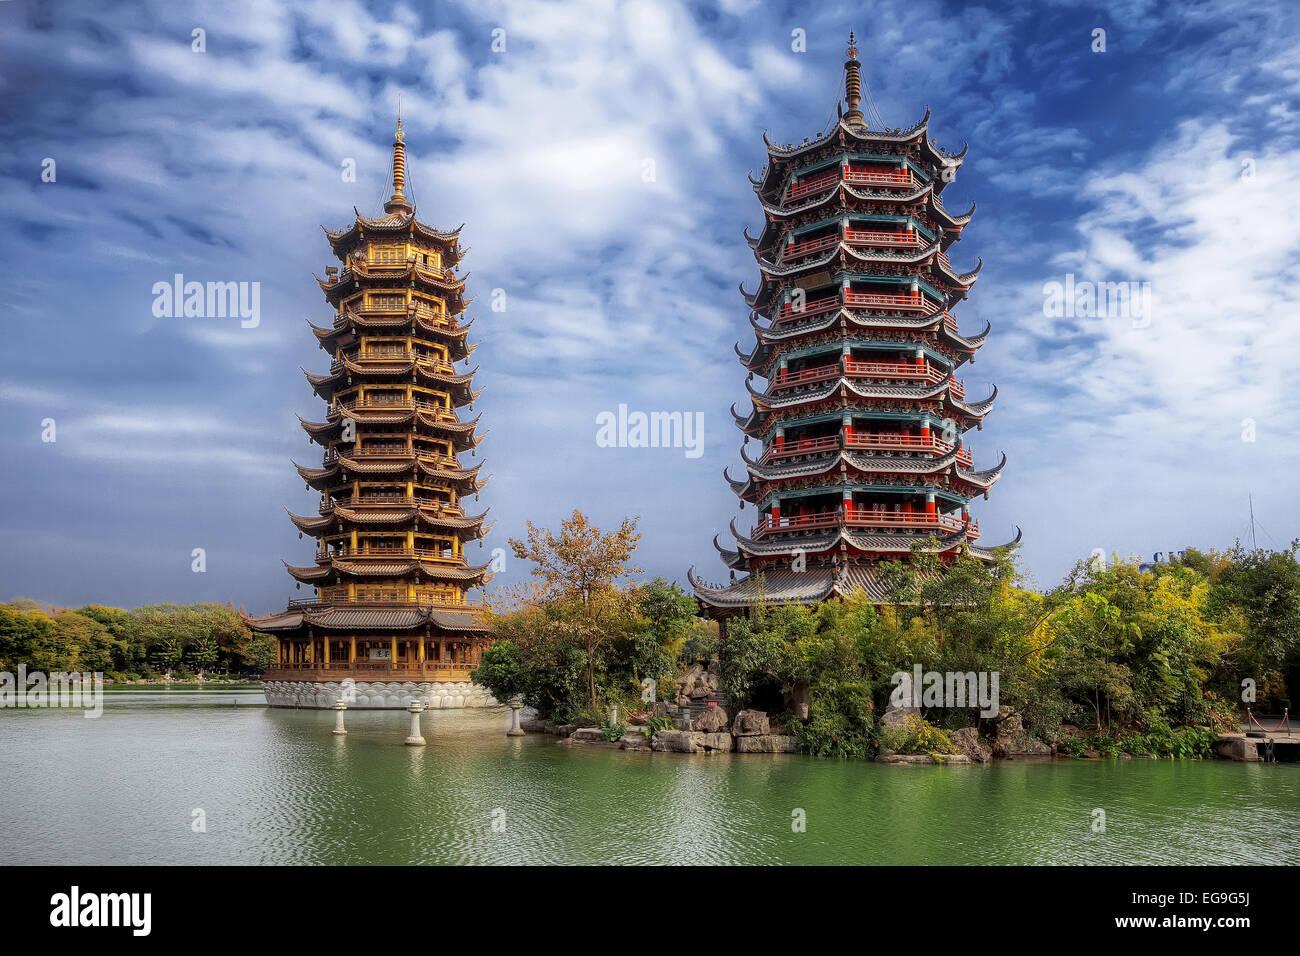 http://c8.alamy.com/comp/EG9G5J/china-guilin-sun-and-moon-twin-pagodas-EG9G5J.jpg